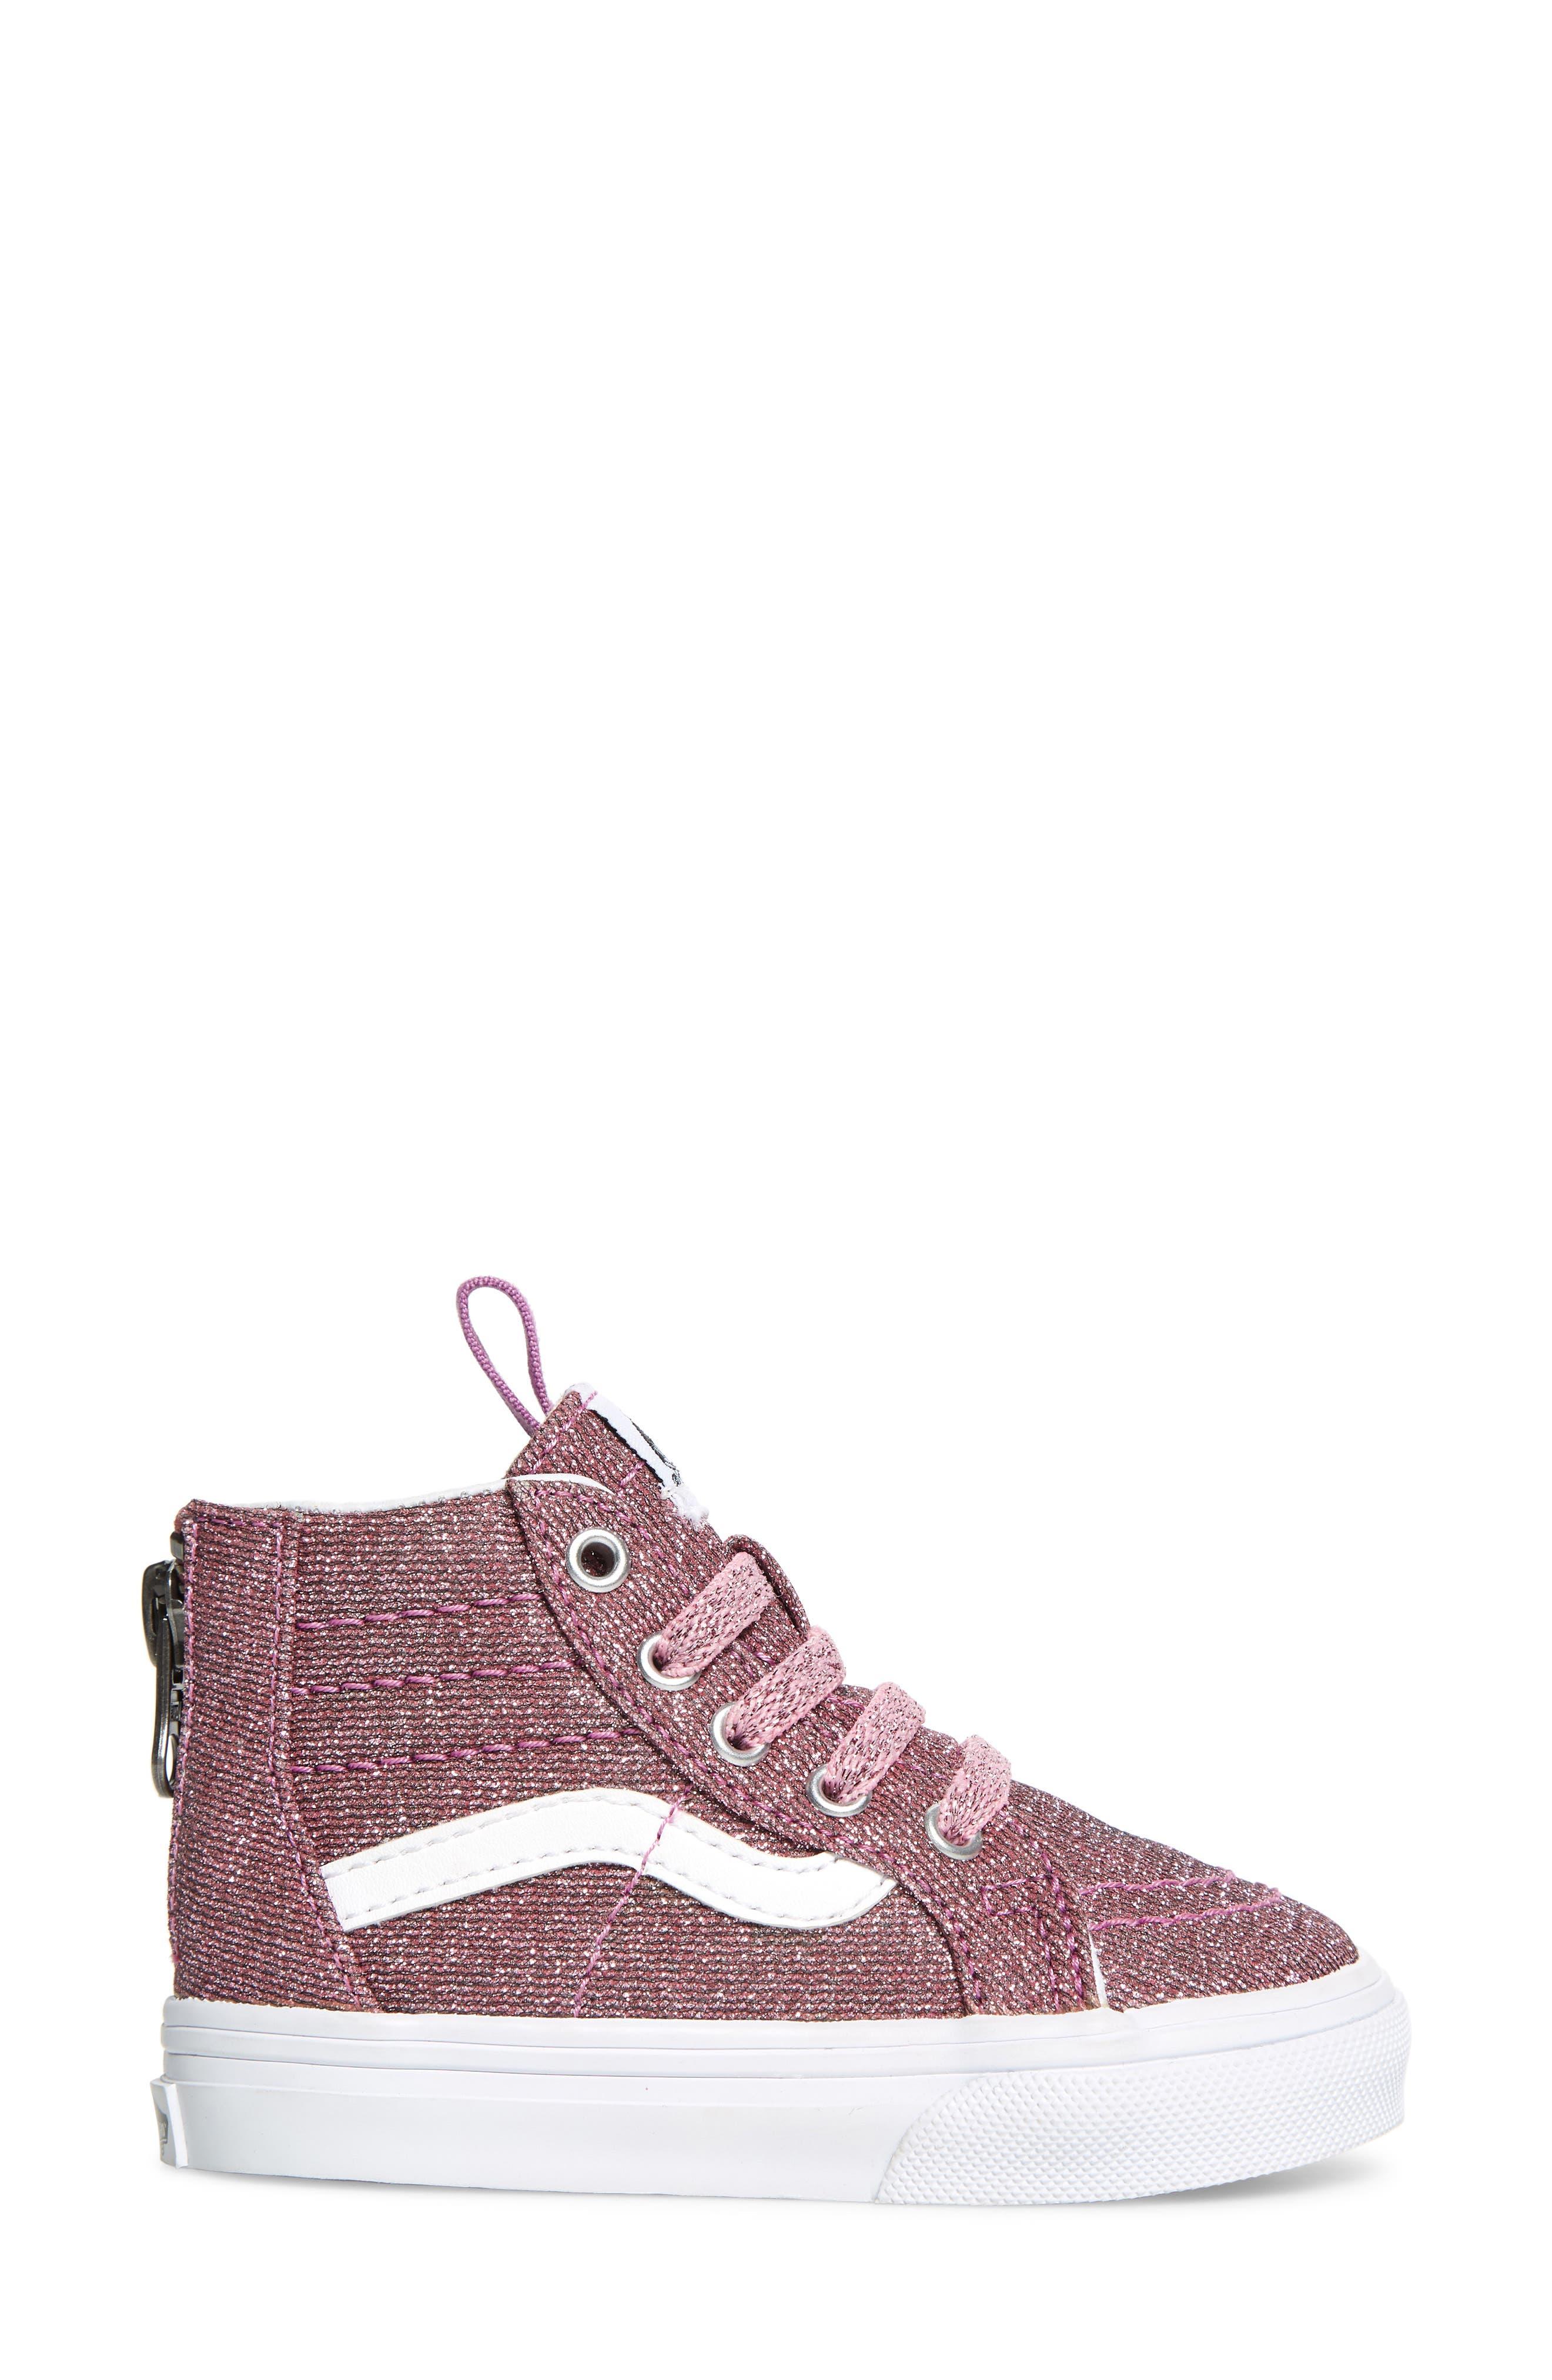 Sk8-Hi Zip Sneaker,                             Alternate thumbnail 6, color,                             Lurex Glitter Pink/ True White